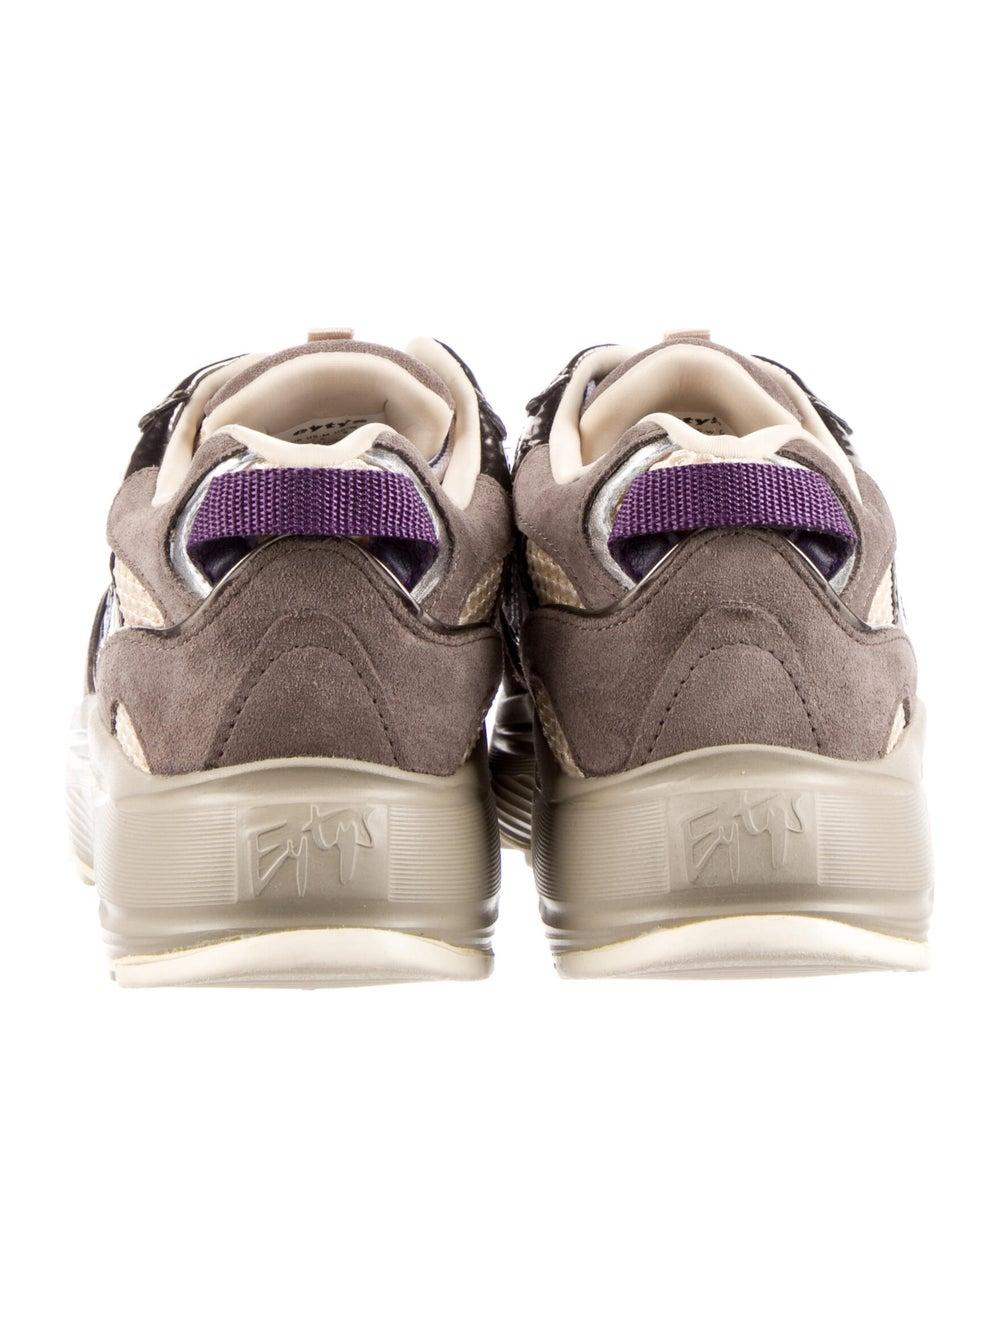 Eytys Jet Iron Sneakers - image 4